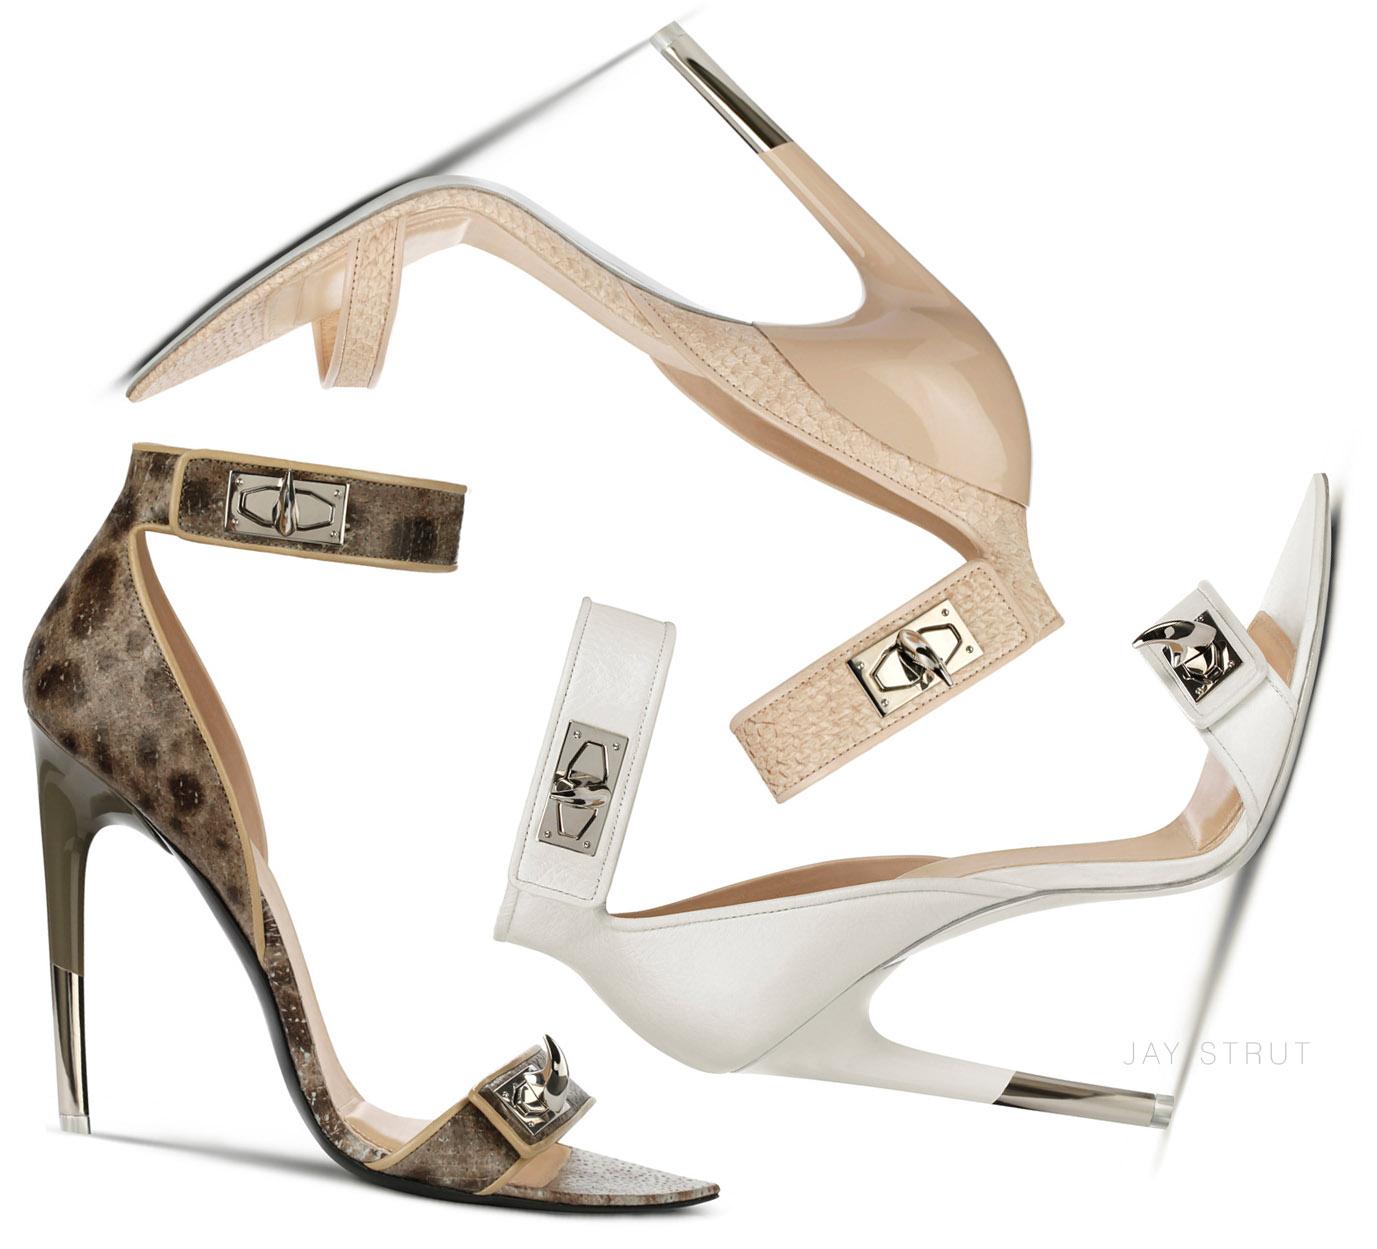 http://2.bp.blogspot.com/-yi70RuGp7xE/TzOEJSVZMnI/AAAAAAAARa4/C3V1sea_f1Q/s1600/GivenchySpring-Summer2012RunwayShoes.jpeg